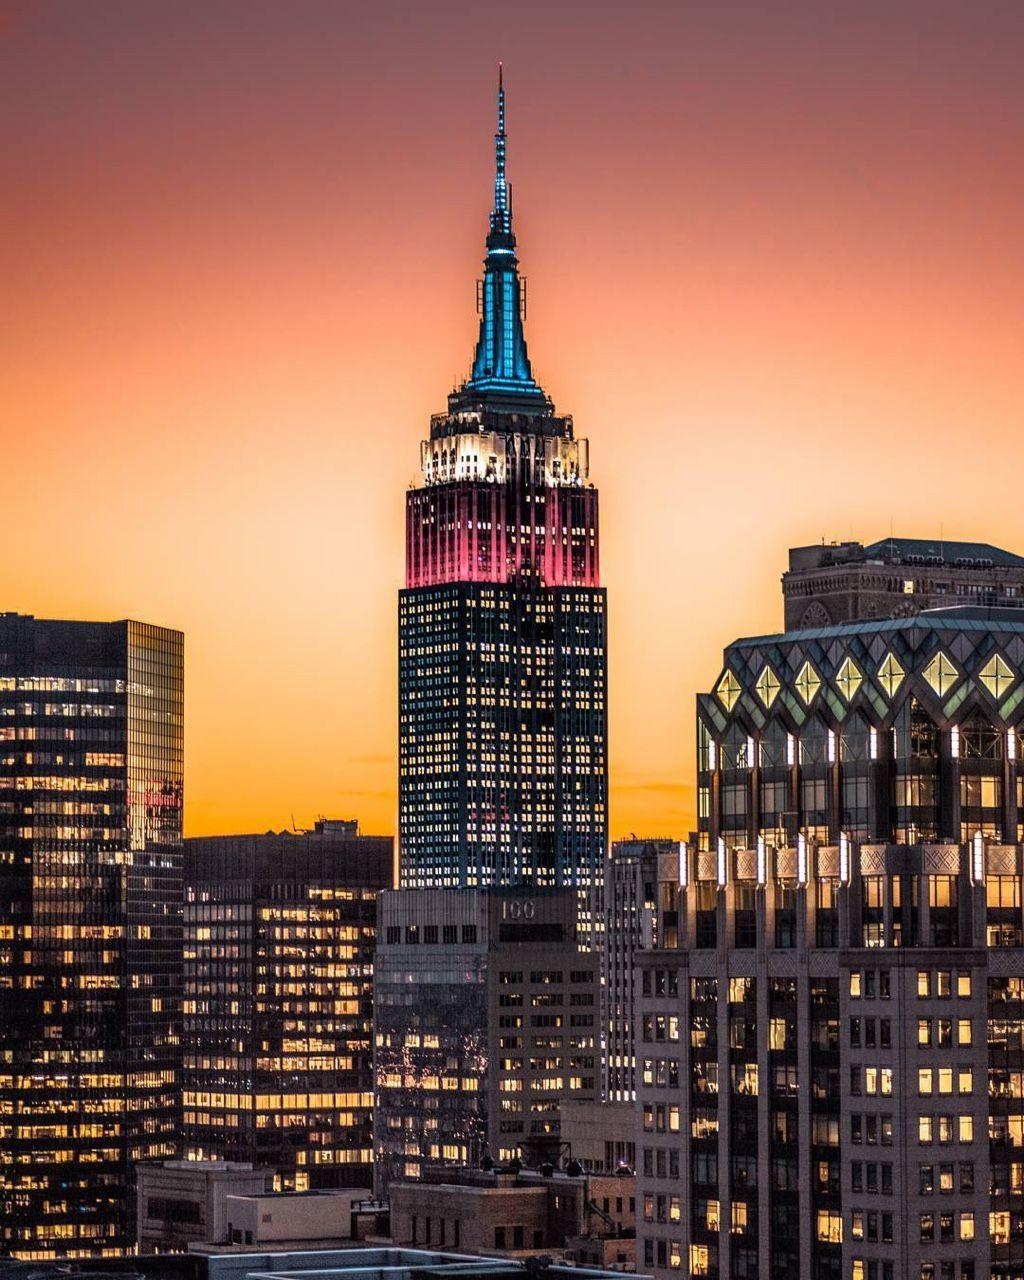 Pin By Jayden On New York, New York In 2018